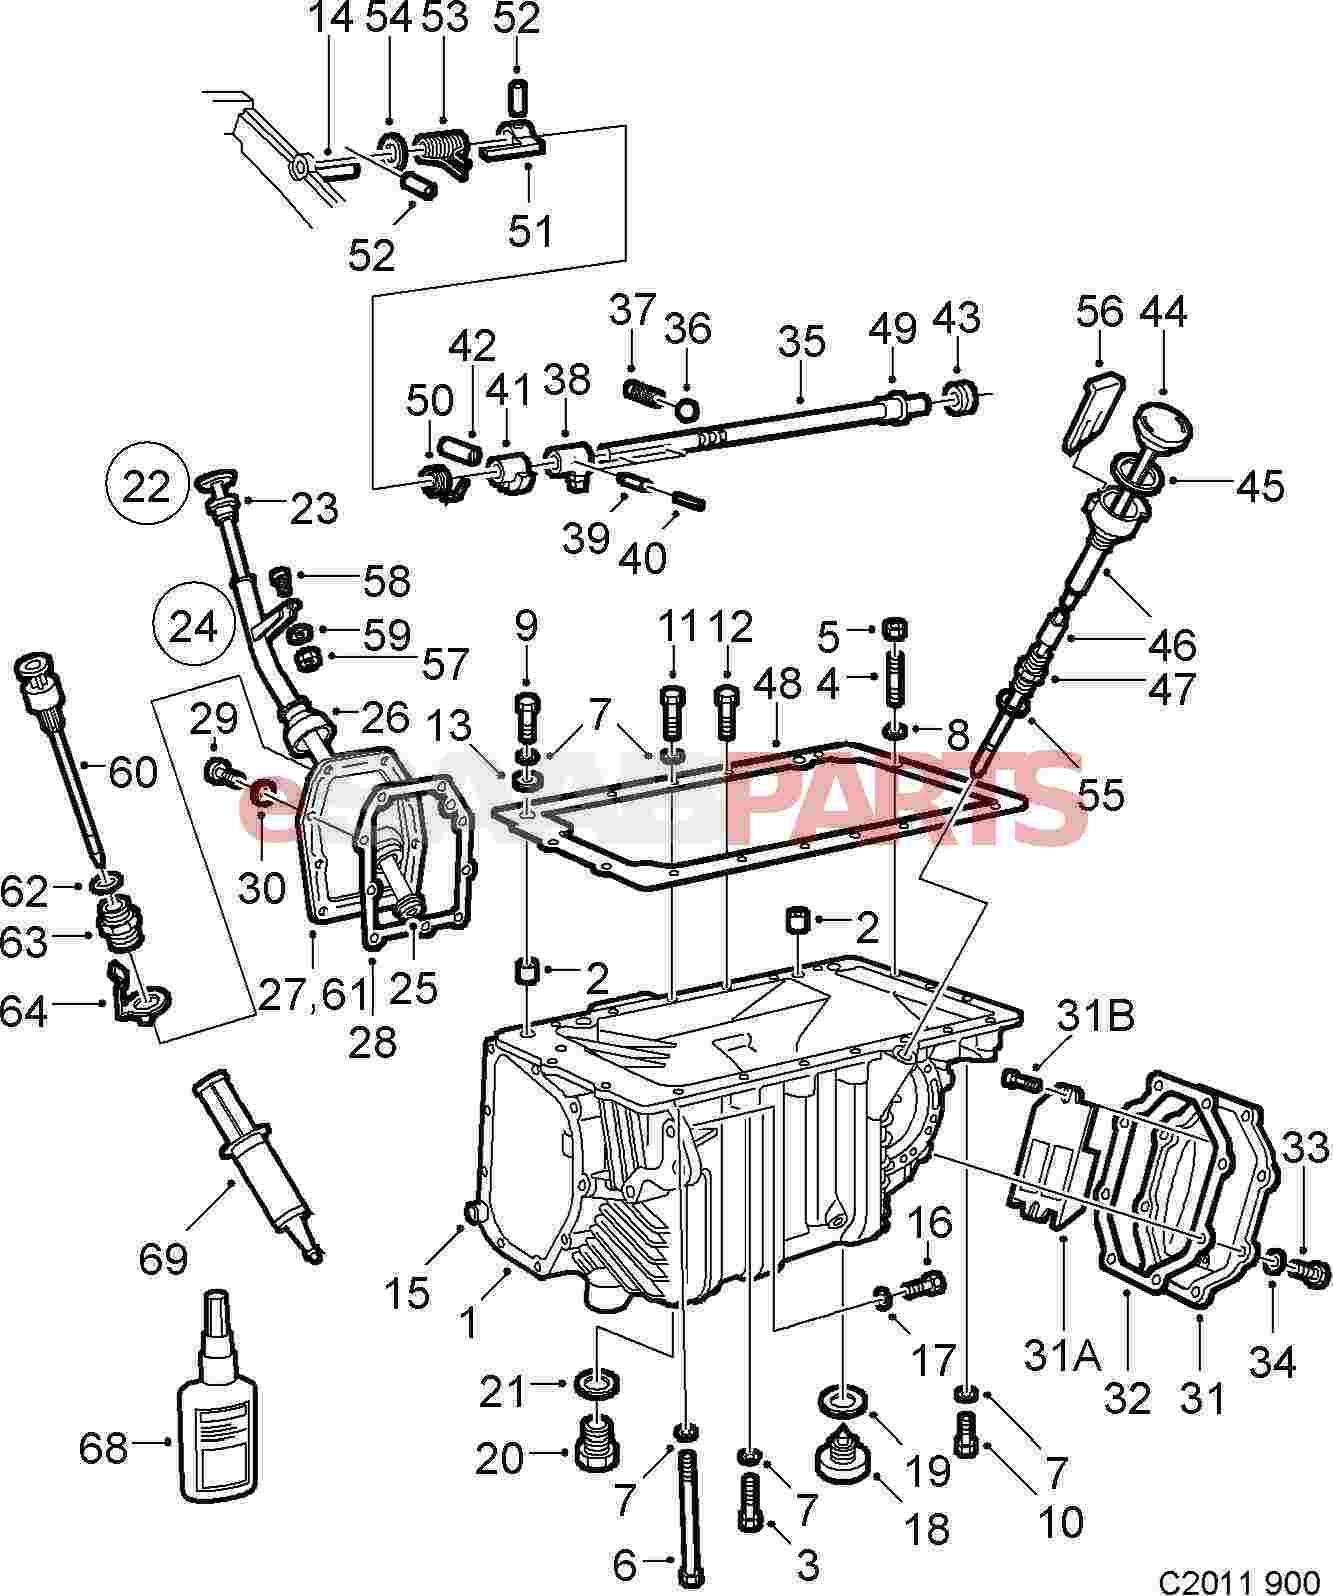 12755009 saab guide pin genuine saab parts from esaabparts com rh esaabparts com Saab 900 Engine Saab 900 Engine